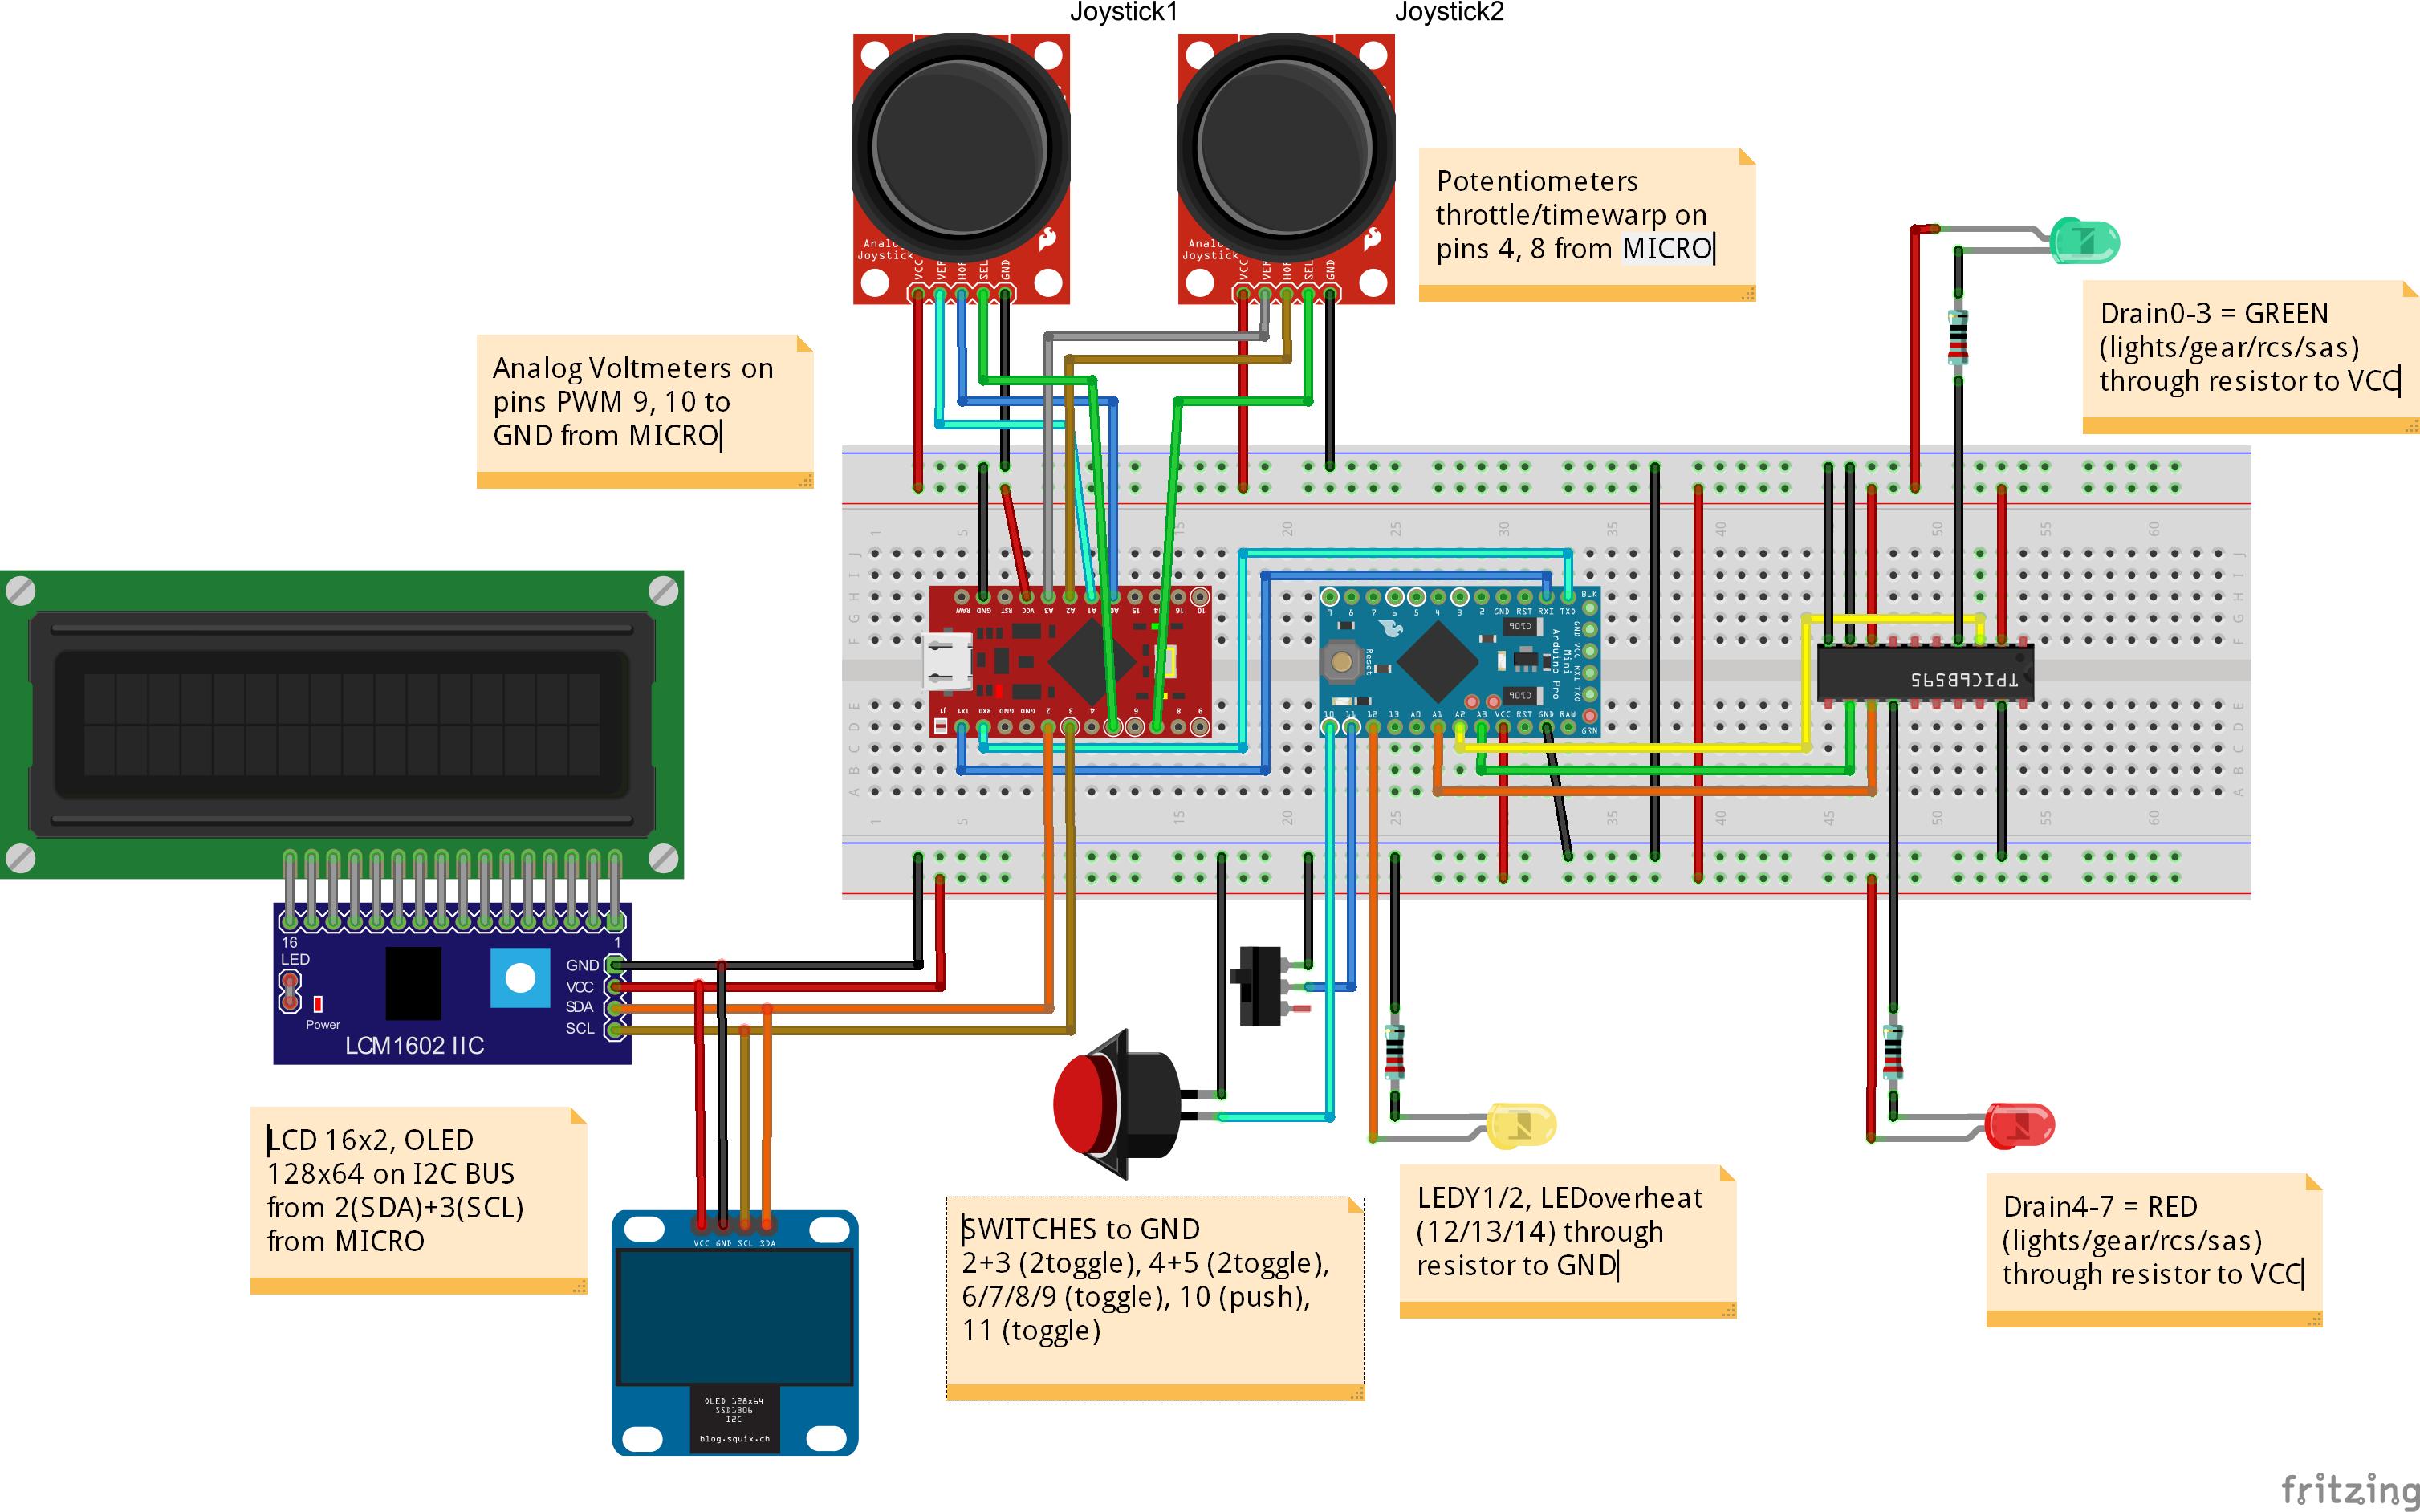 Ksp Gegi A Custom Status And Control Panel Plea For Ideas 2 Axis Joystick Wiring Diagrams 7597931451565415217